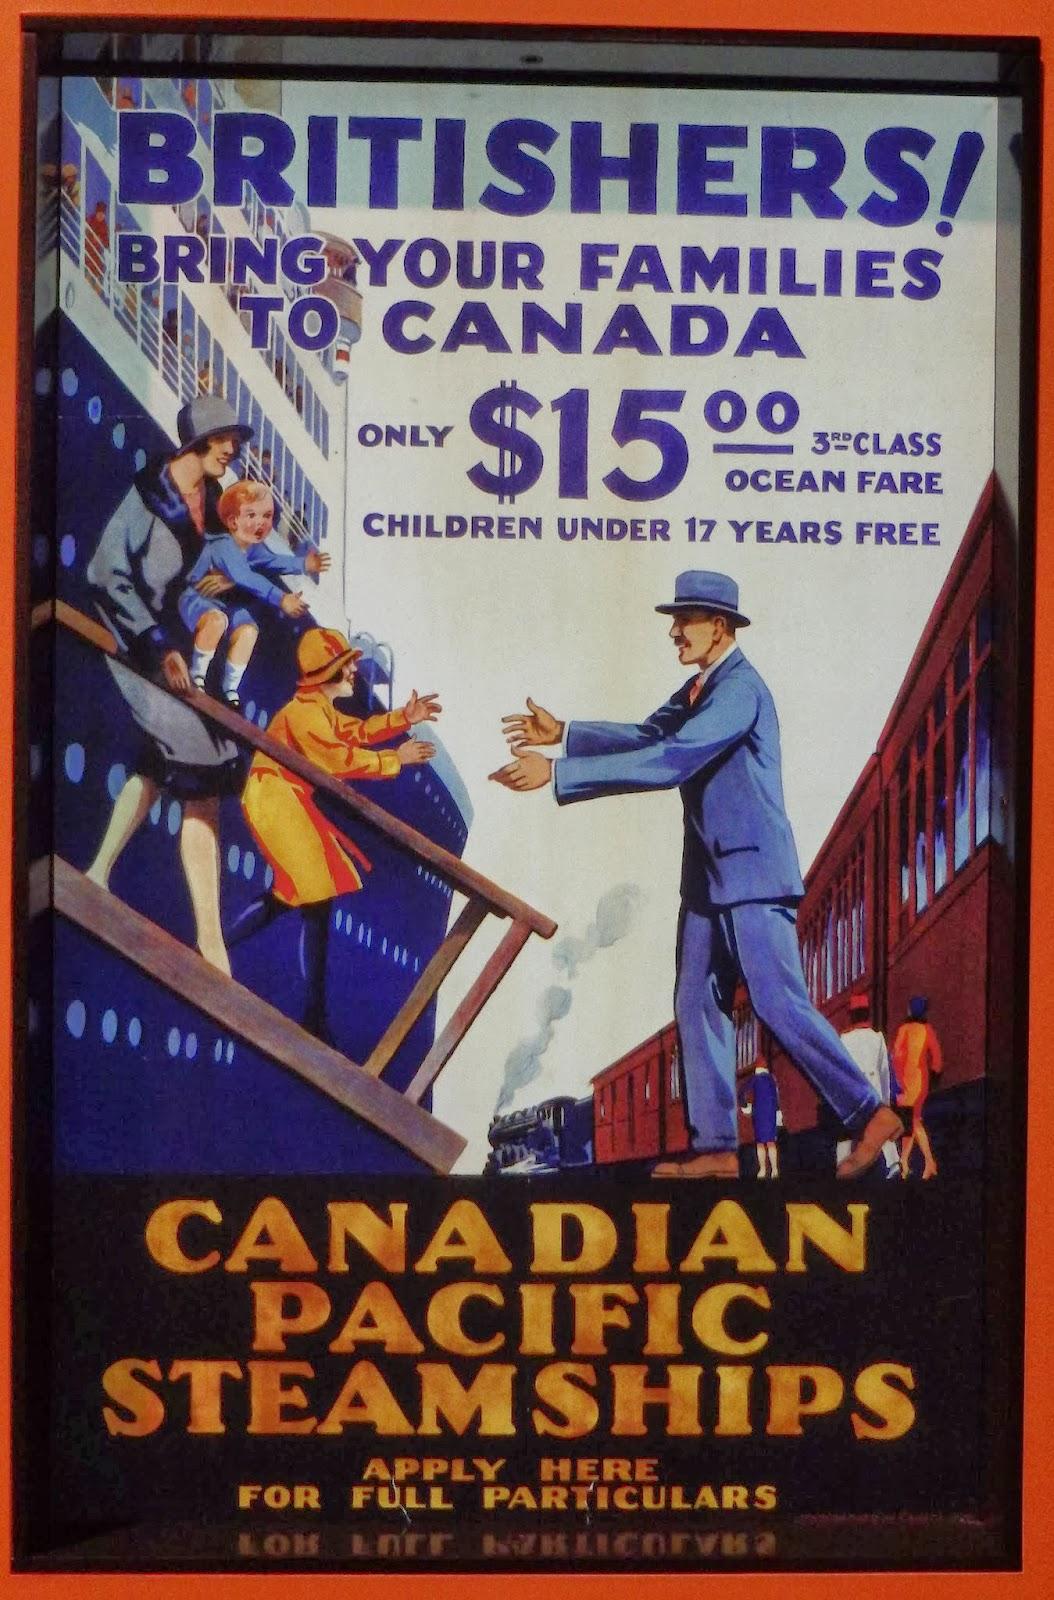 Vente a Canadá, Pepe!